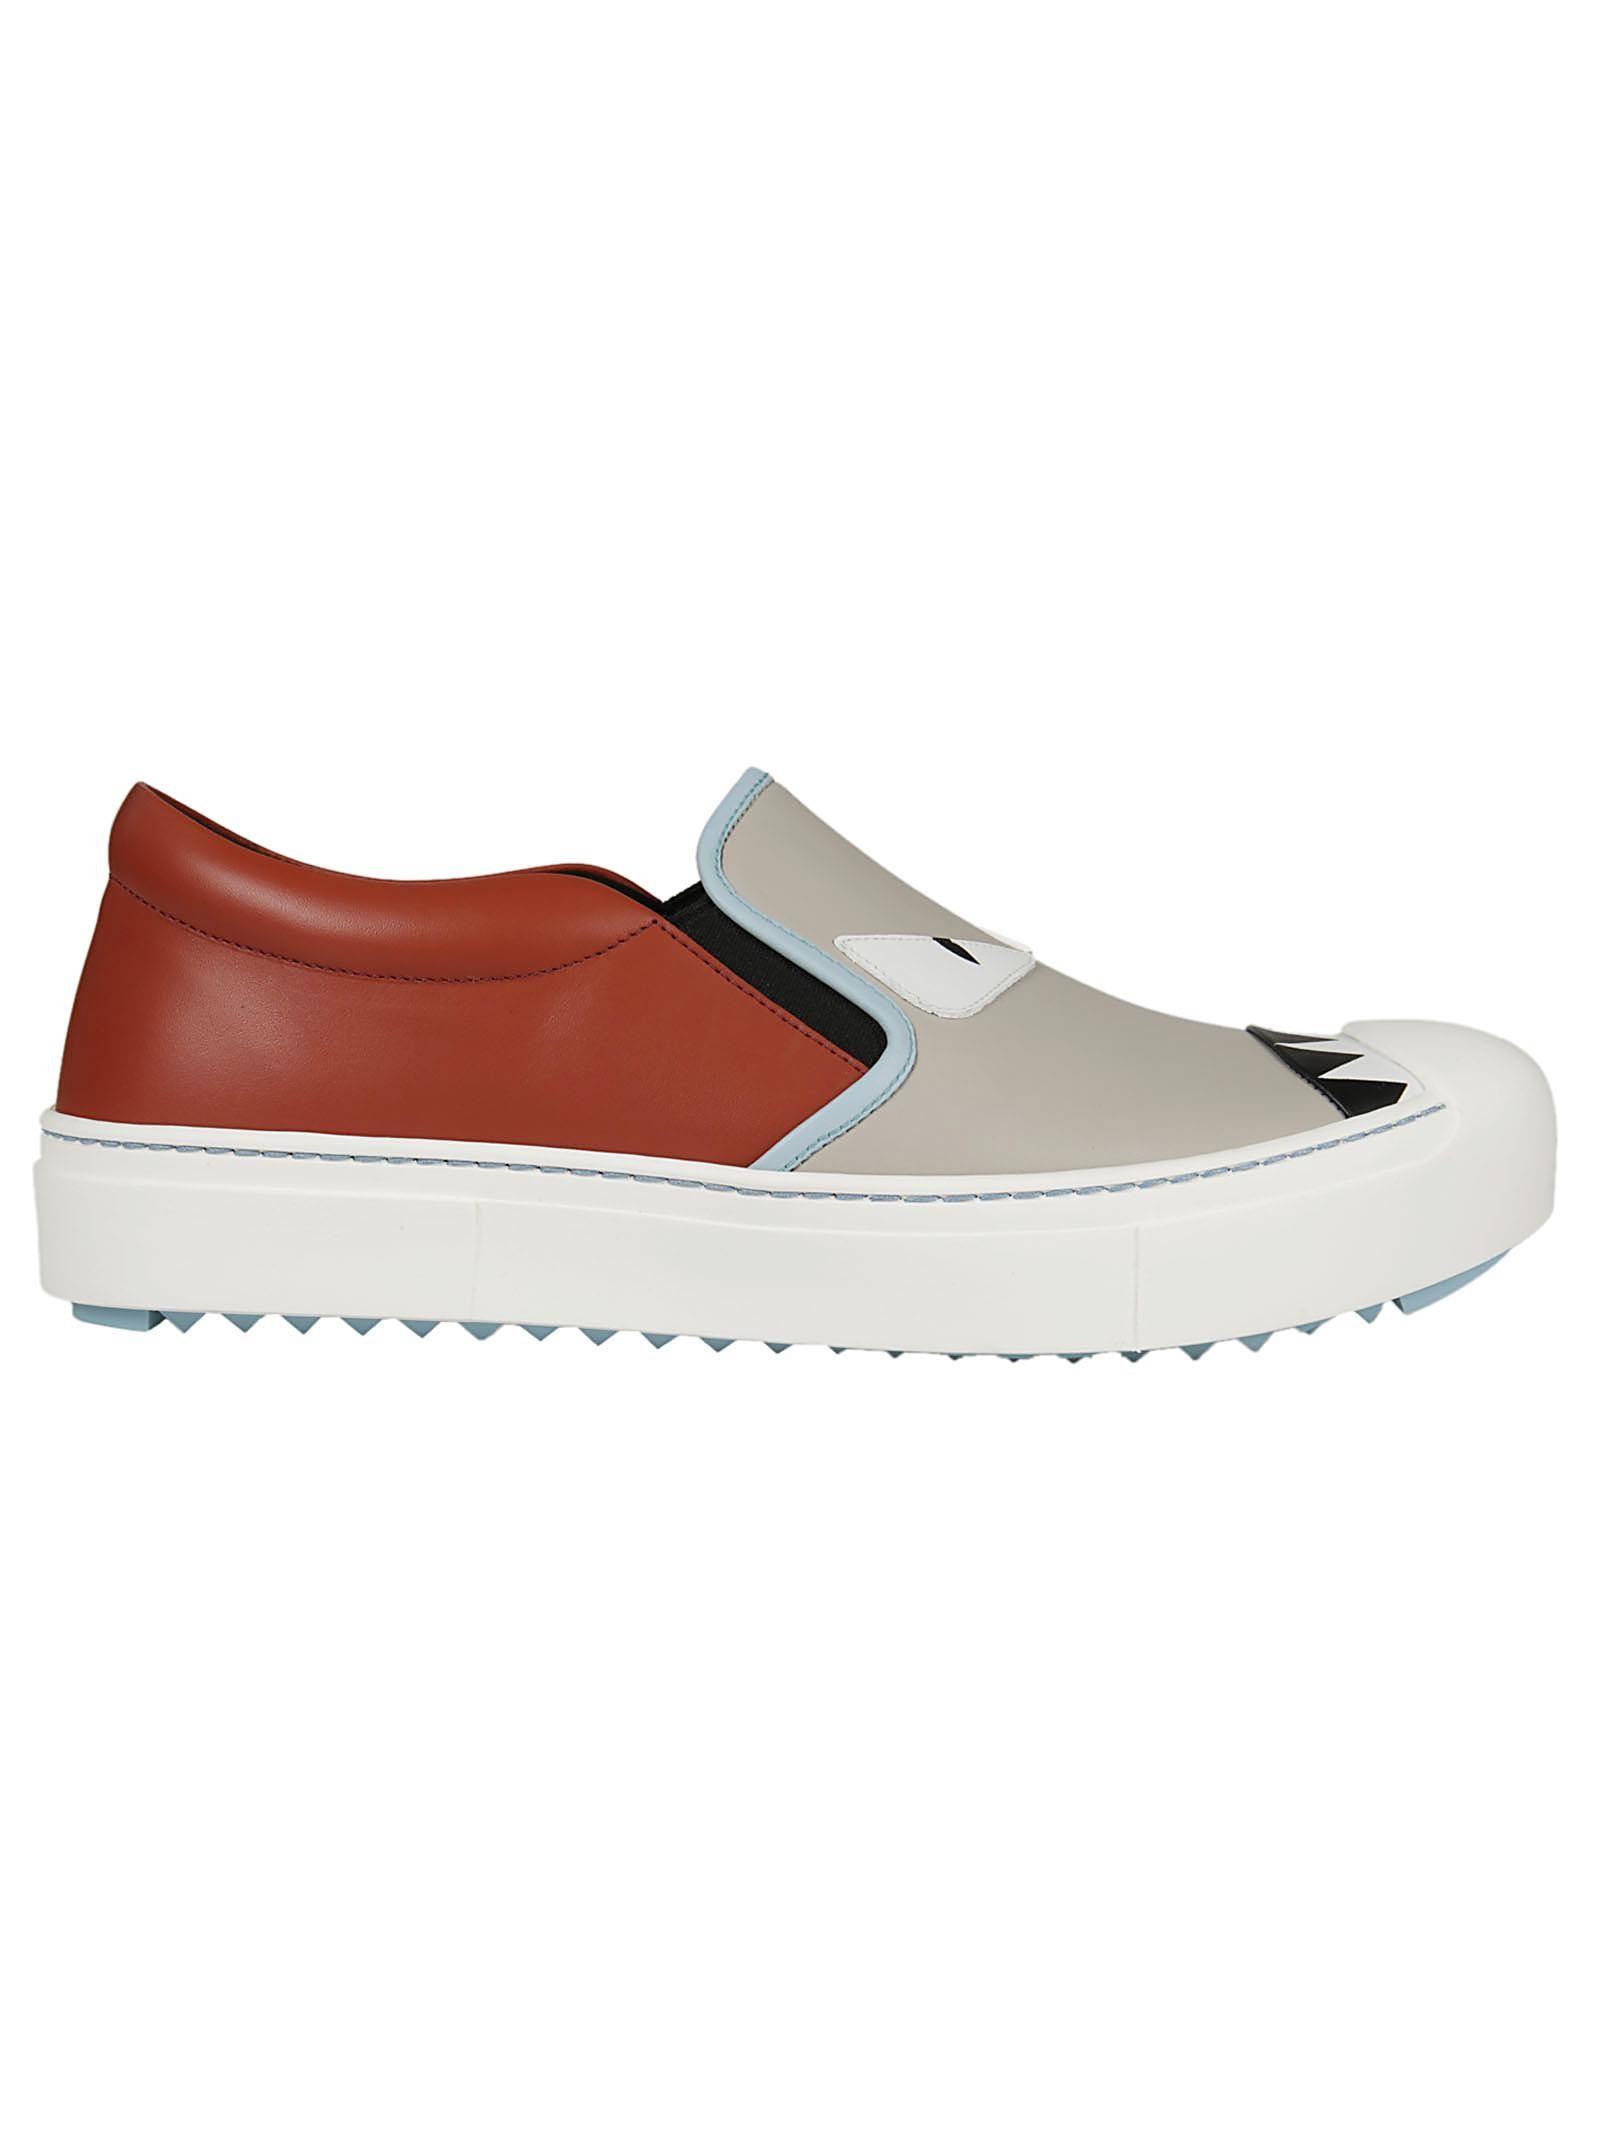 Fendi Embellished Slip-on Sneakers